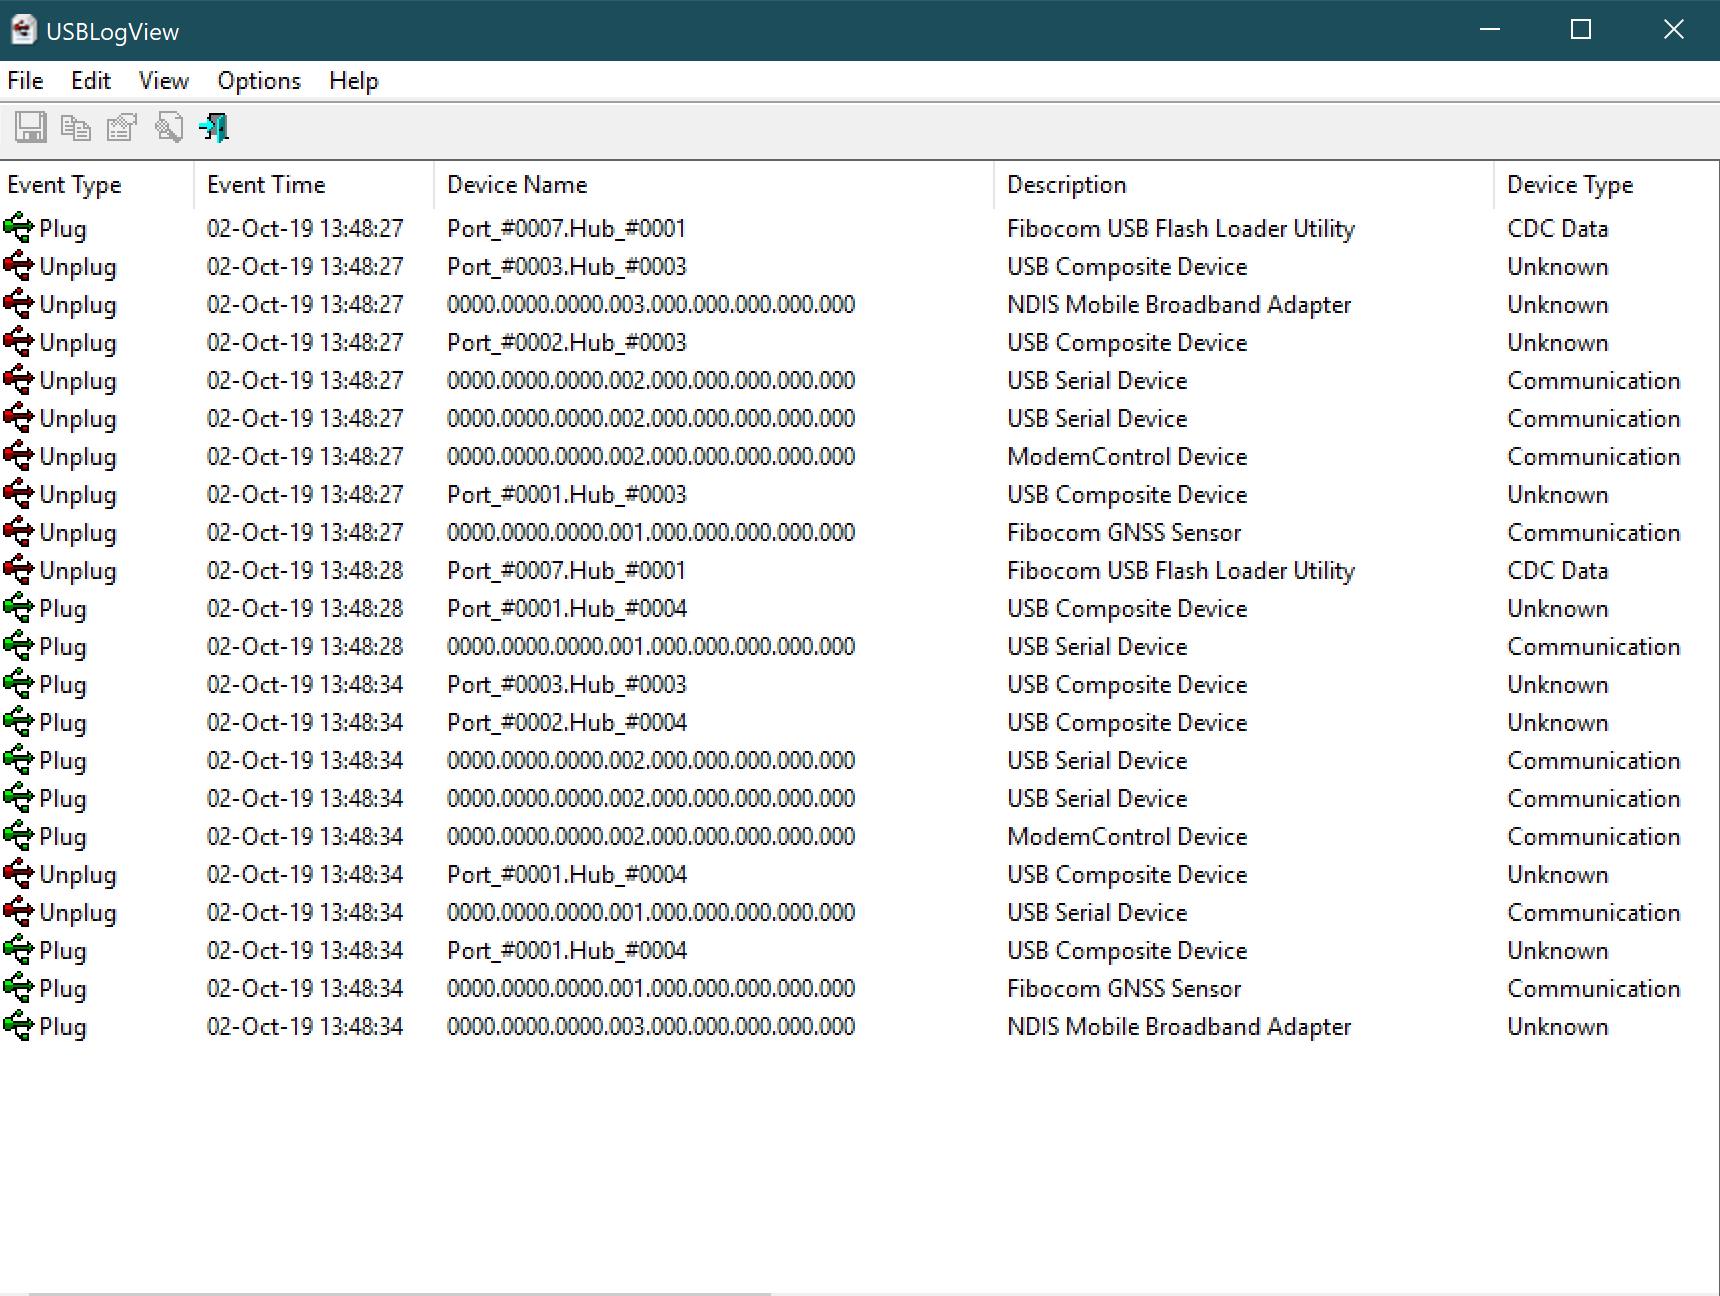 Fibocom L850-GL WWAN Problems on Multiple T480s Laptops-English Community